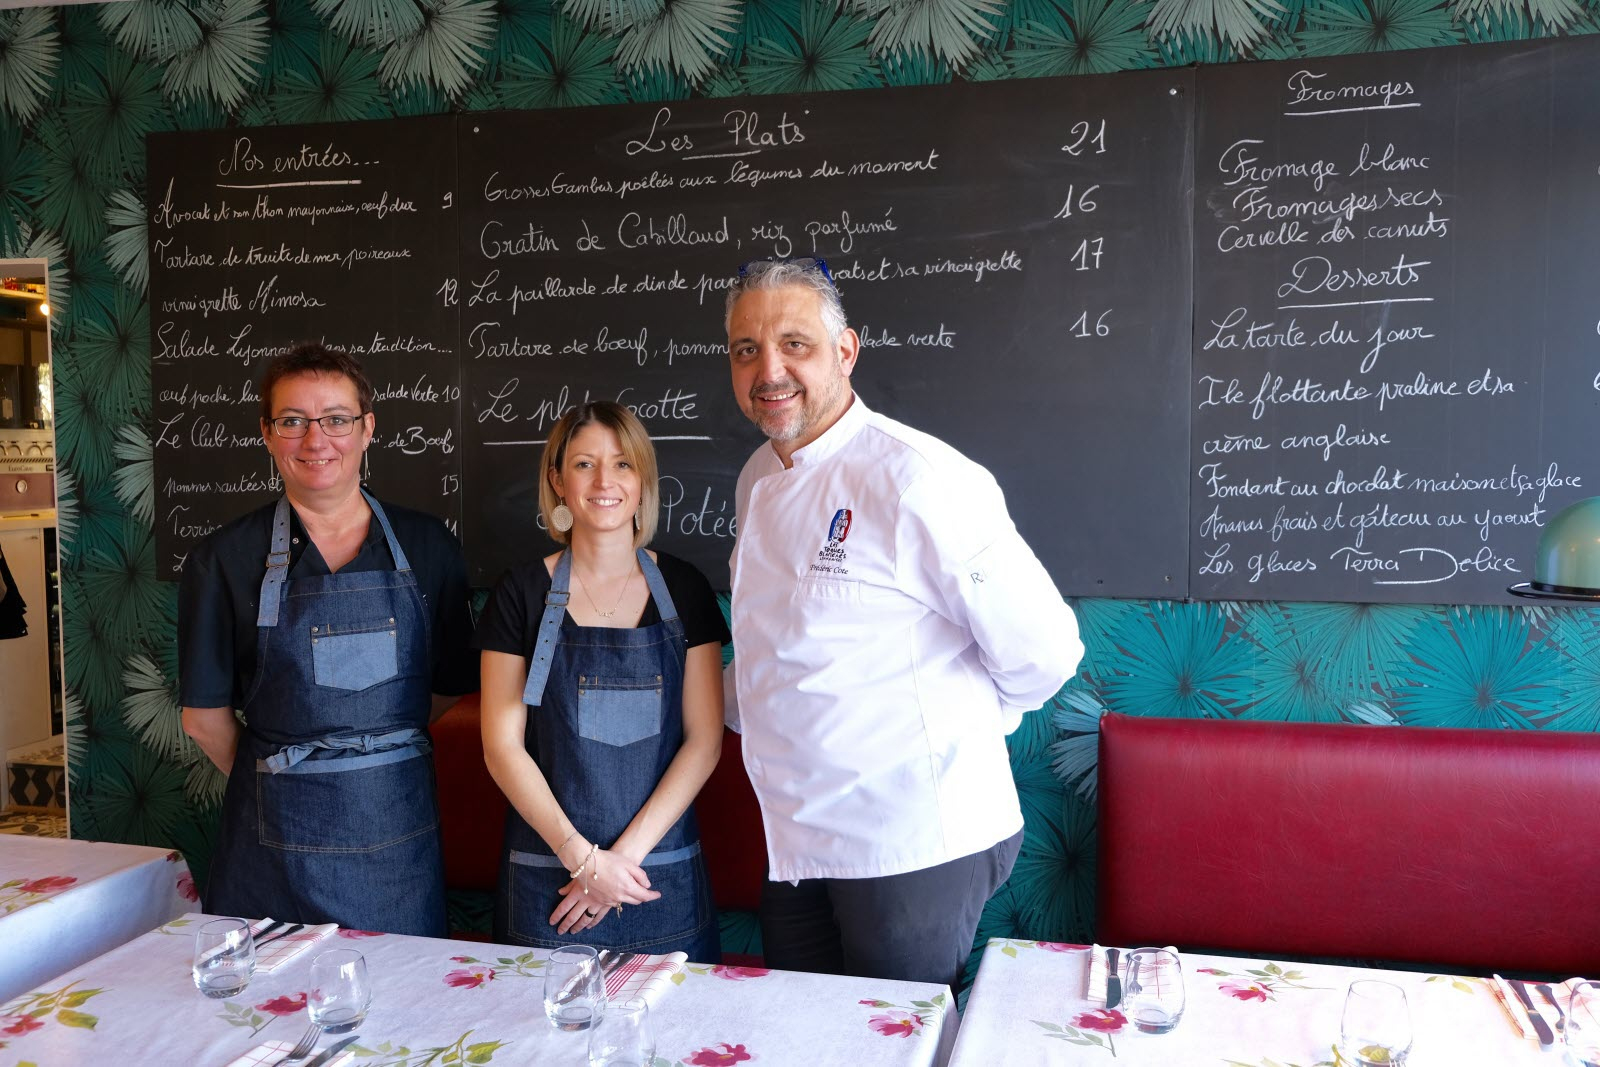 Lyon | Notre Resto Coup De Cœur : Ah Les Bons Petits Plats dedans Ah Les Cro